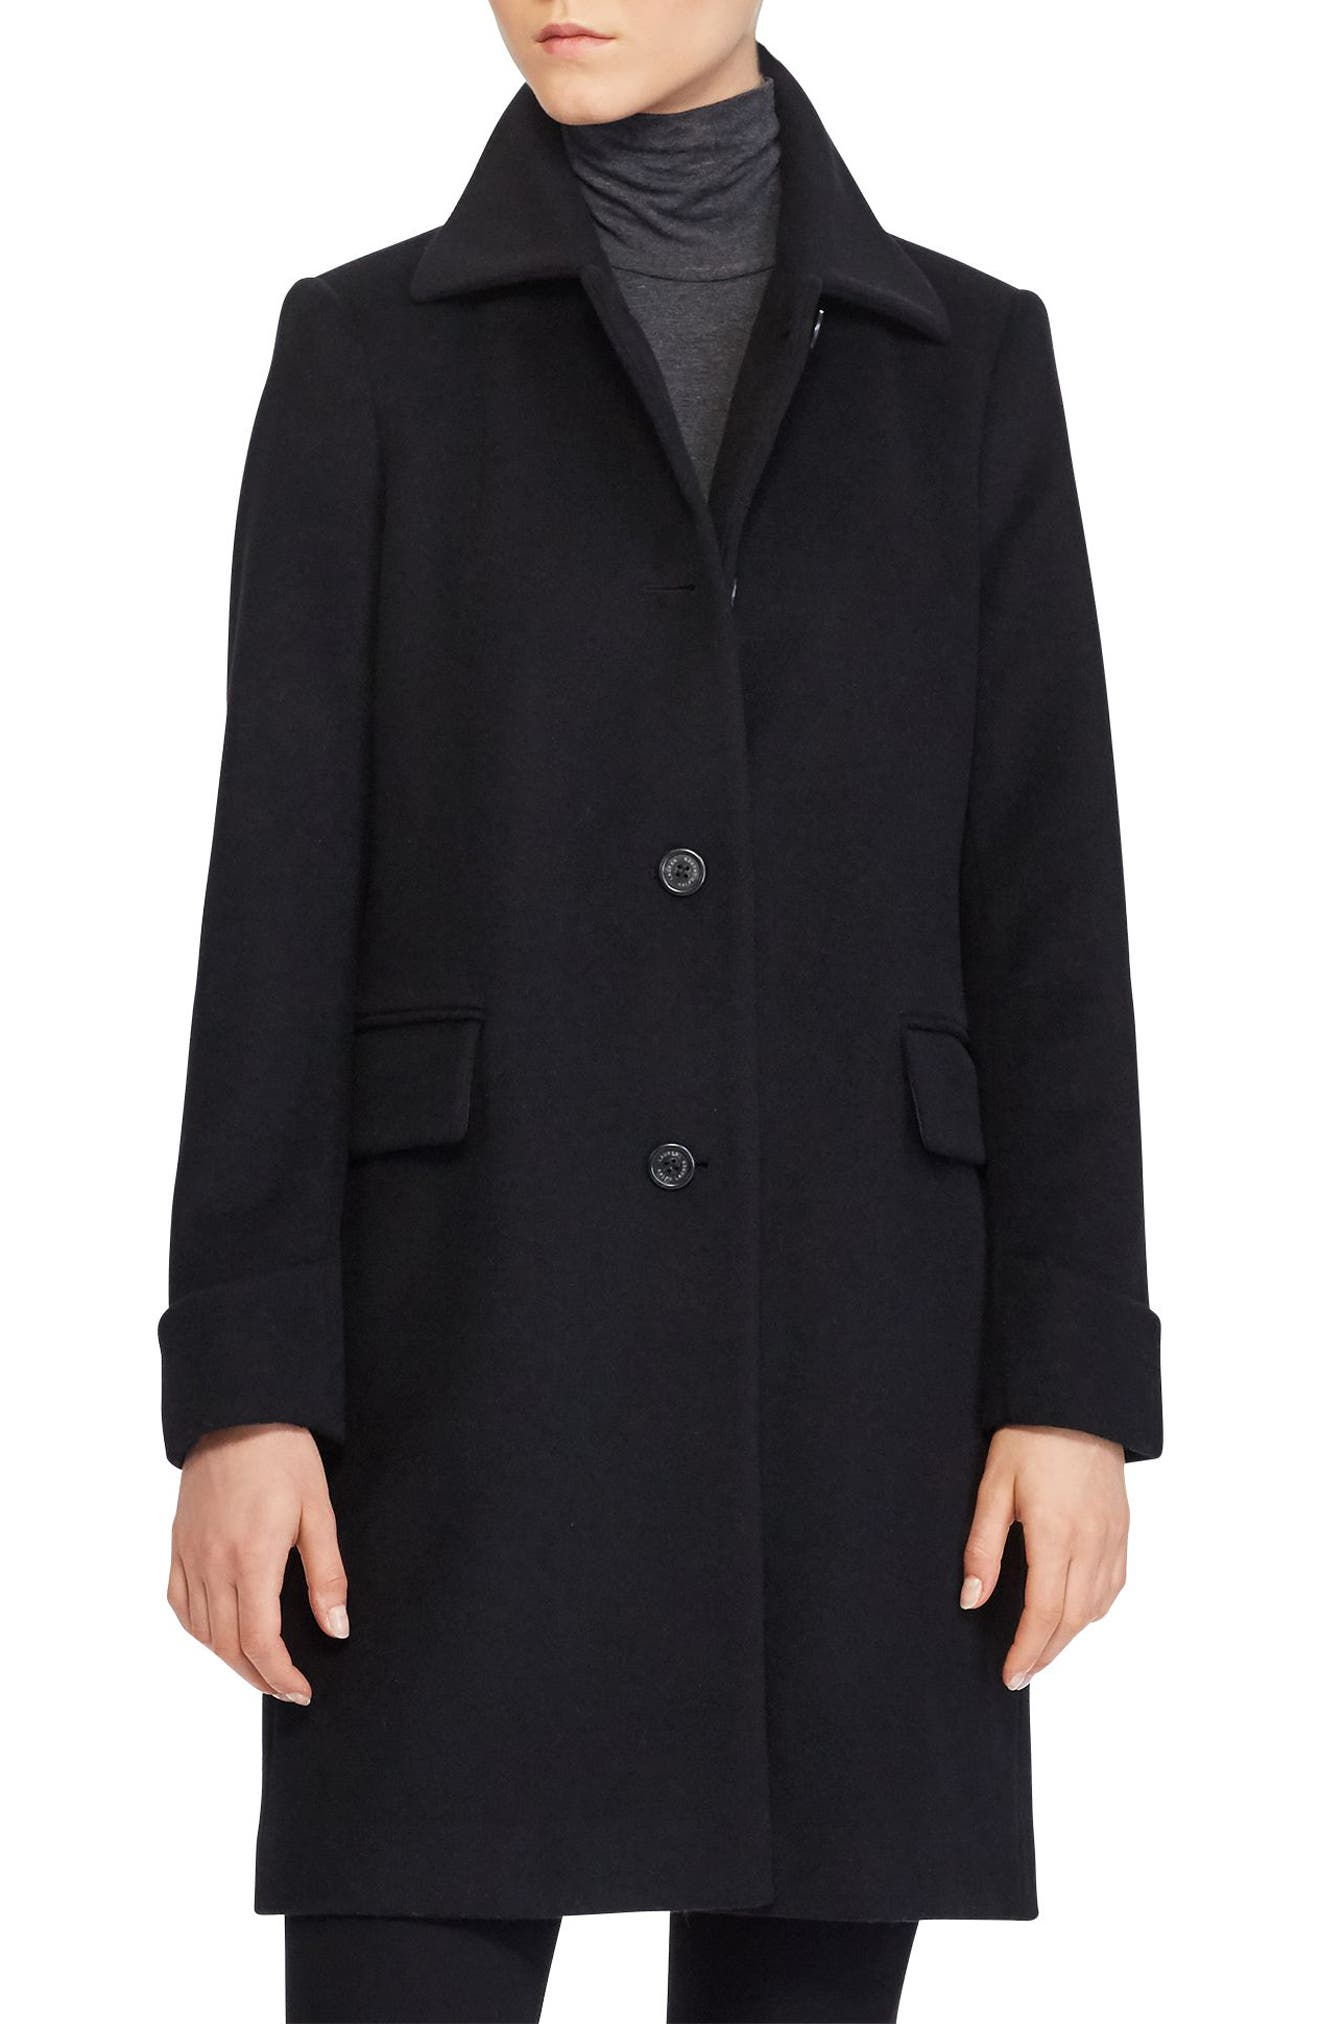 Wool Blend Coat,                             Main thumbnail 1, color,                             001